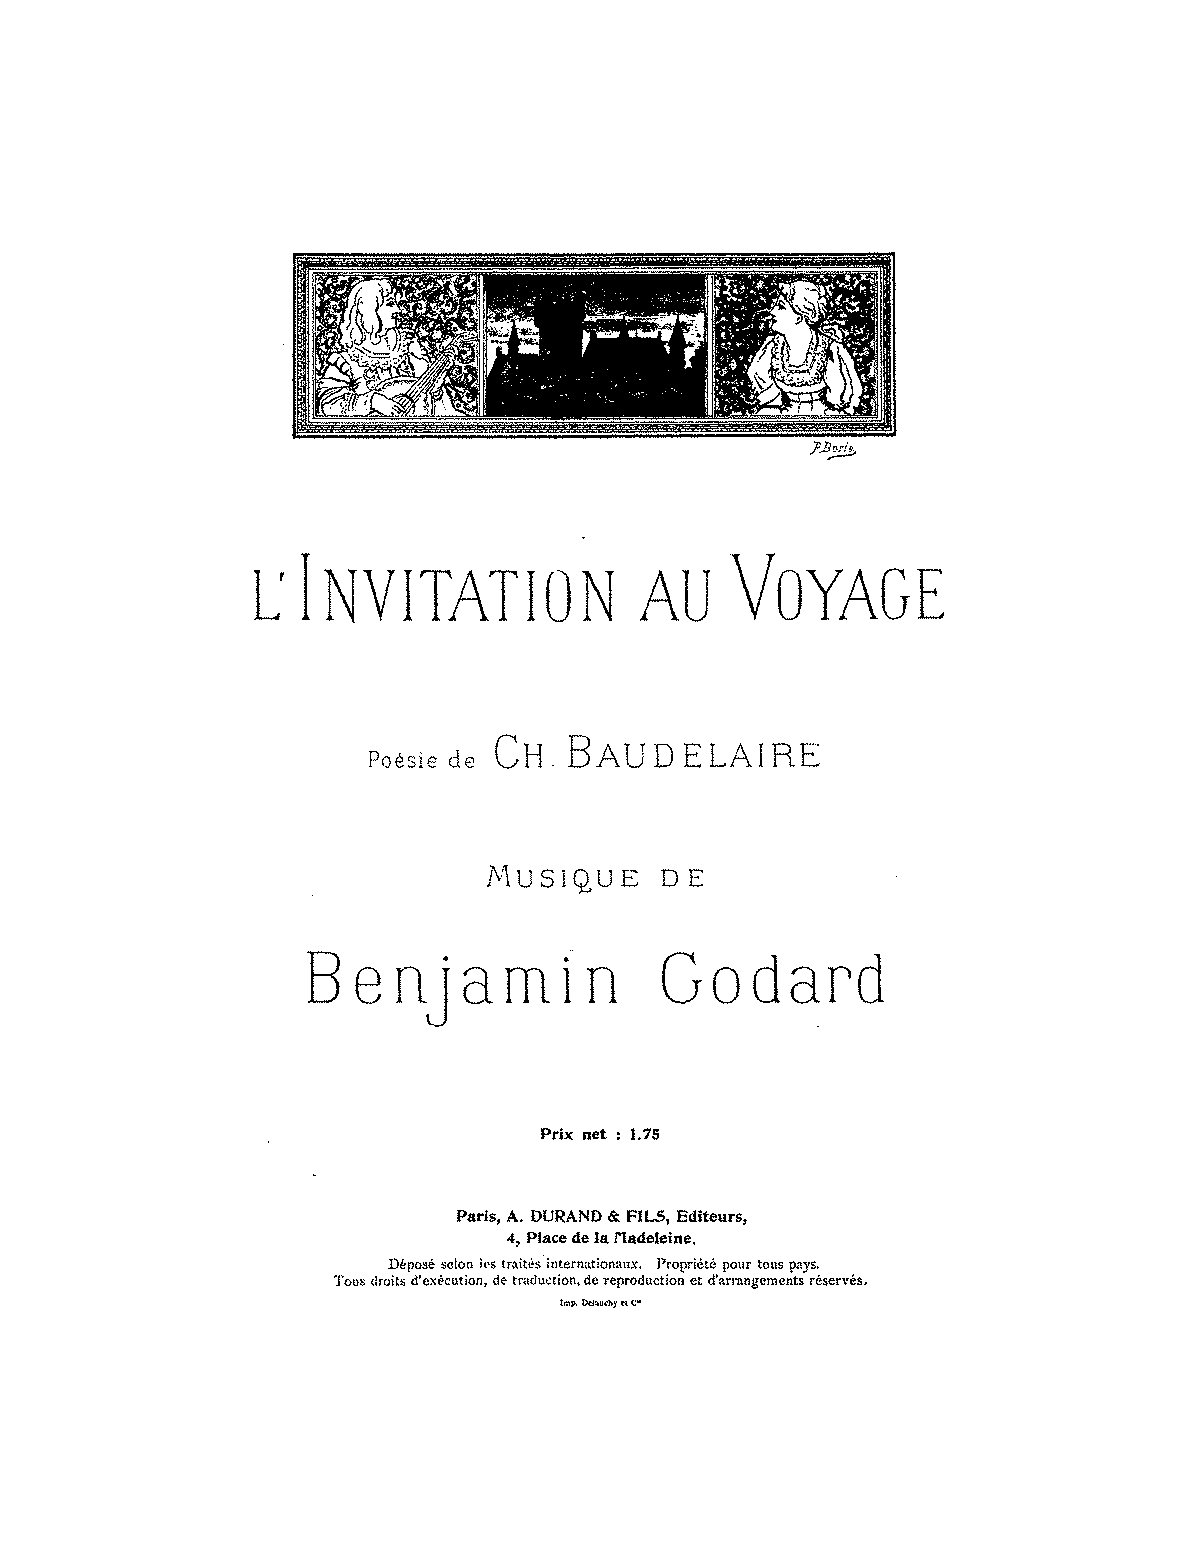 Linvitation au voyage op114 godard benjamin imslppetrucci general information stopboris Gallery